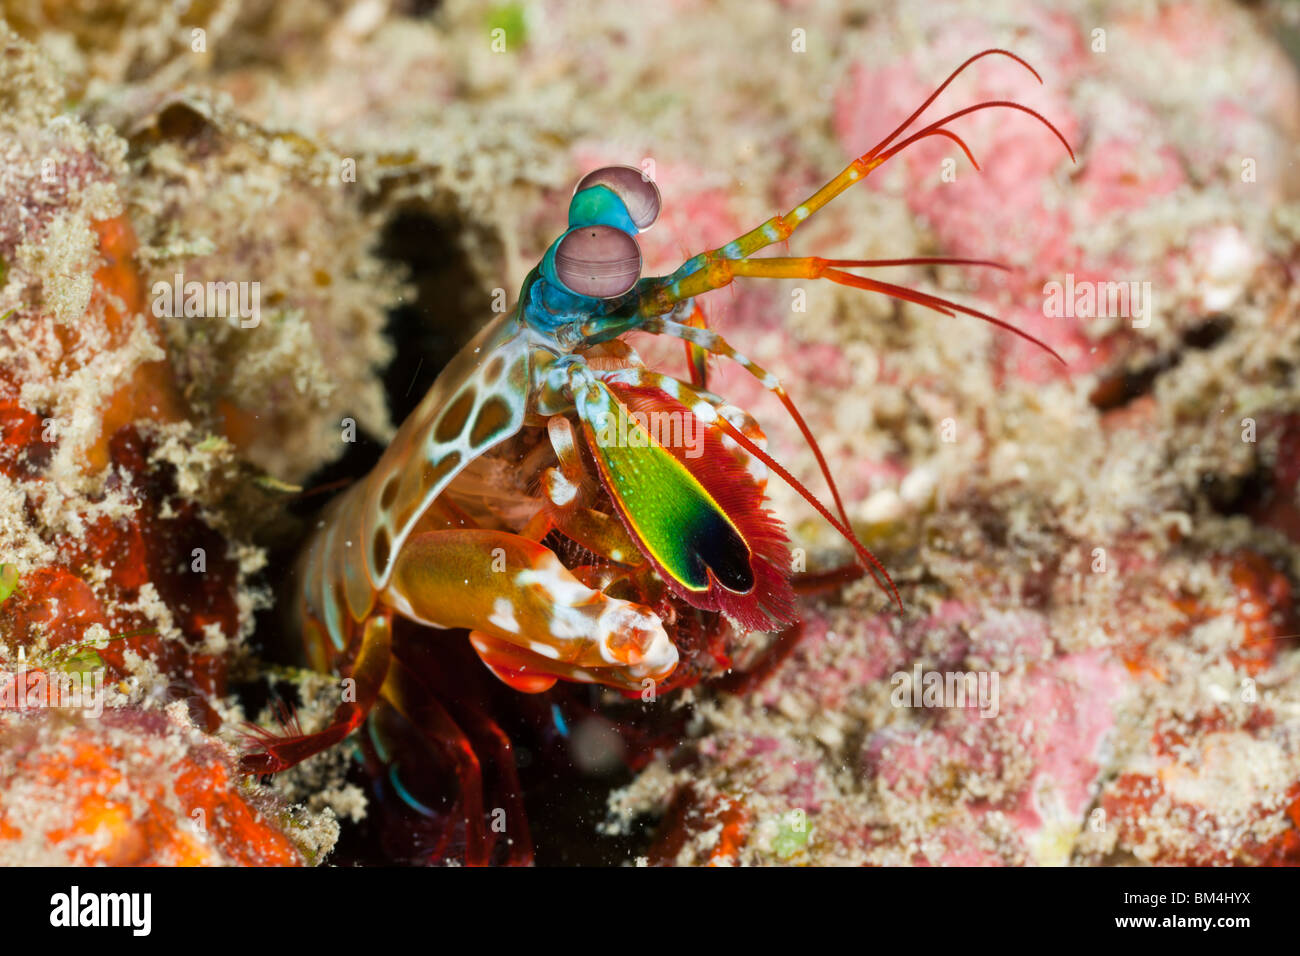 Mantis Shrimp, Odontodactylus scyllarus, Raja Ampat, West Papua, Indonesia - Stock Image